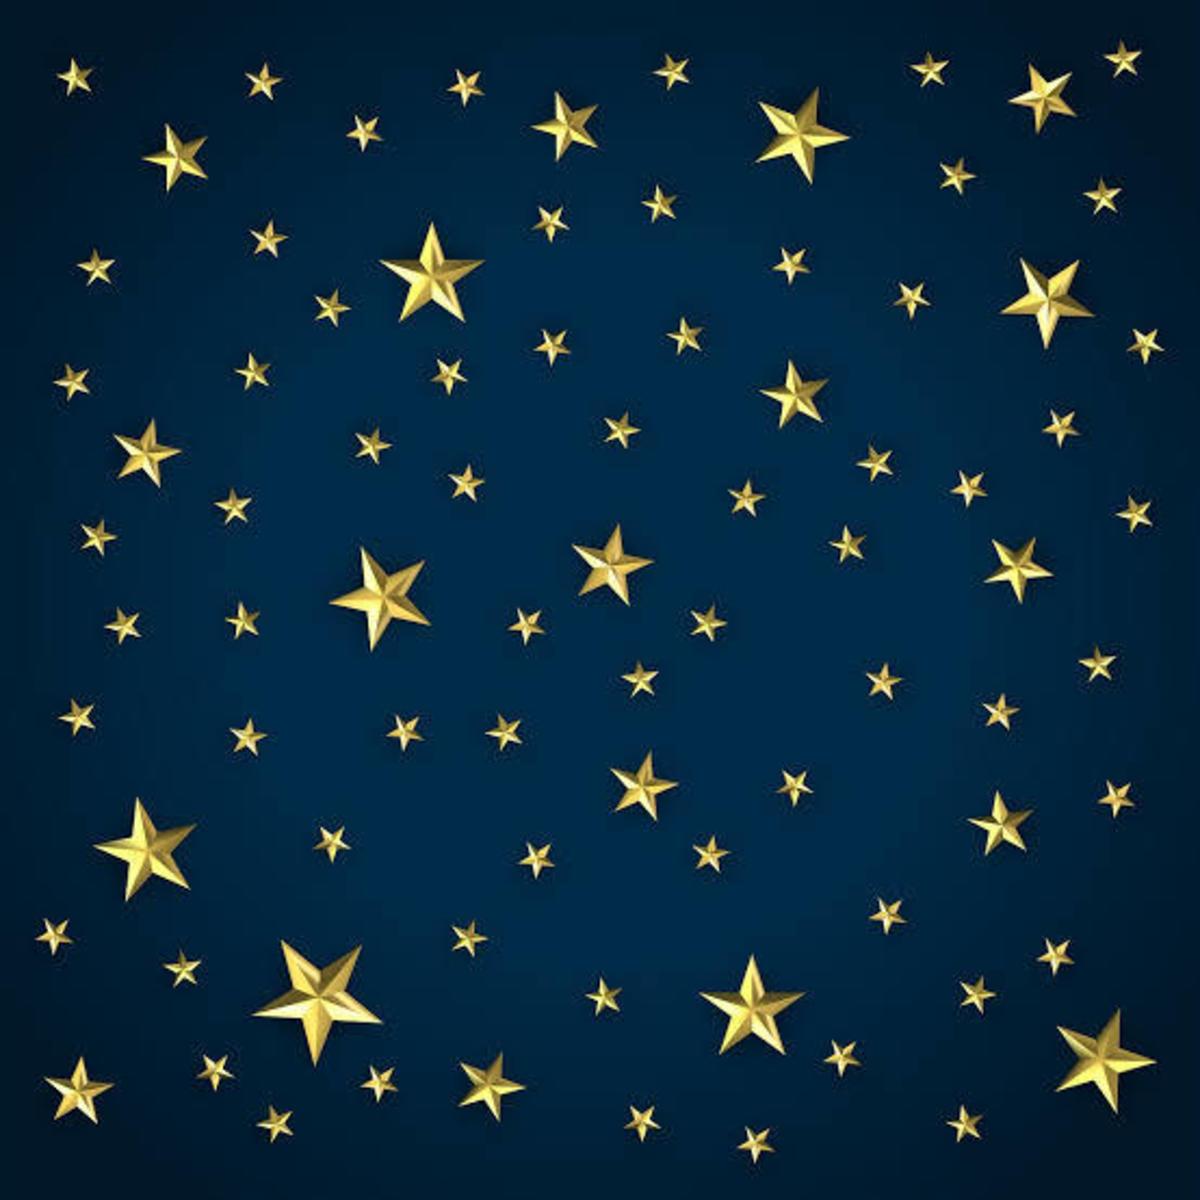 The Stars Still Shine